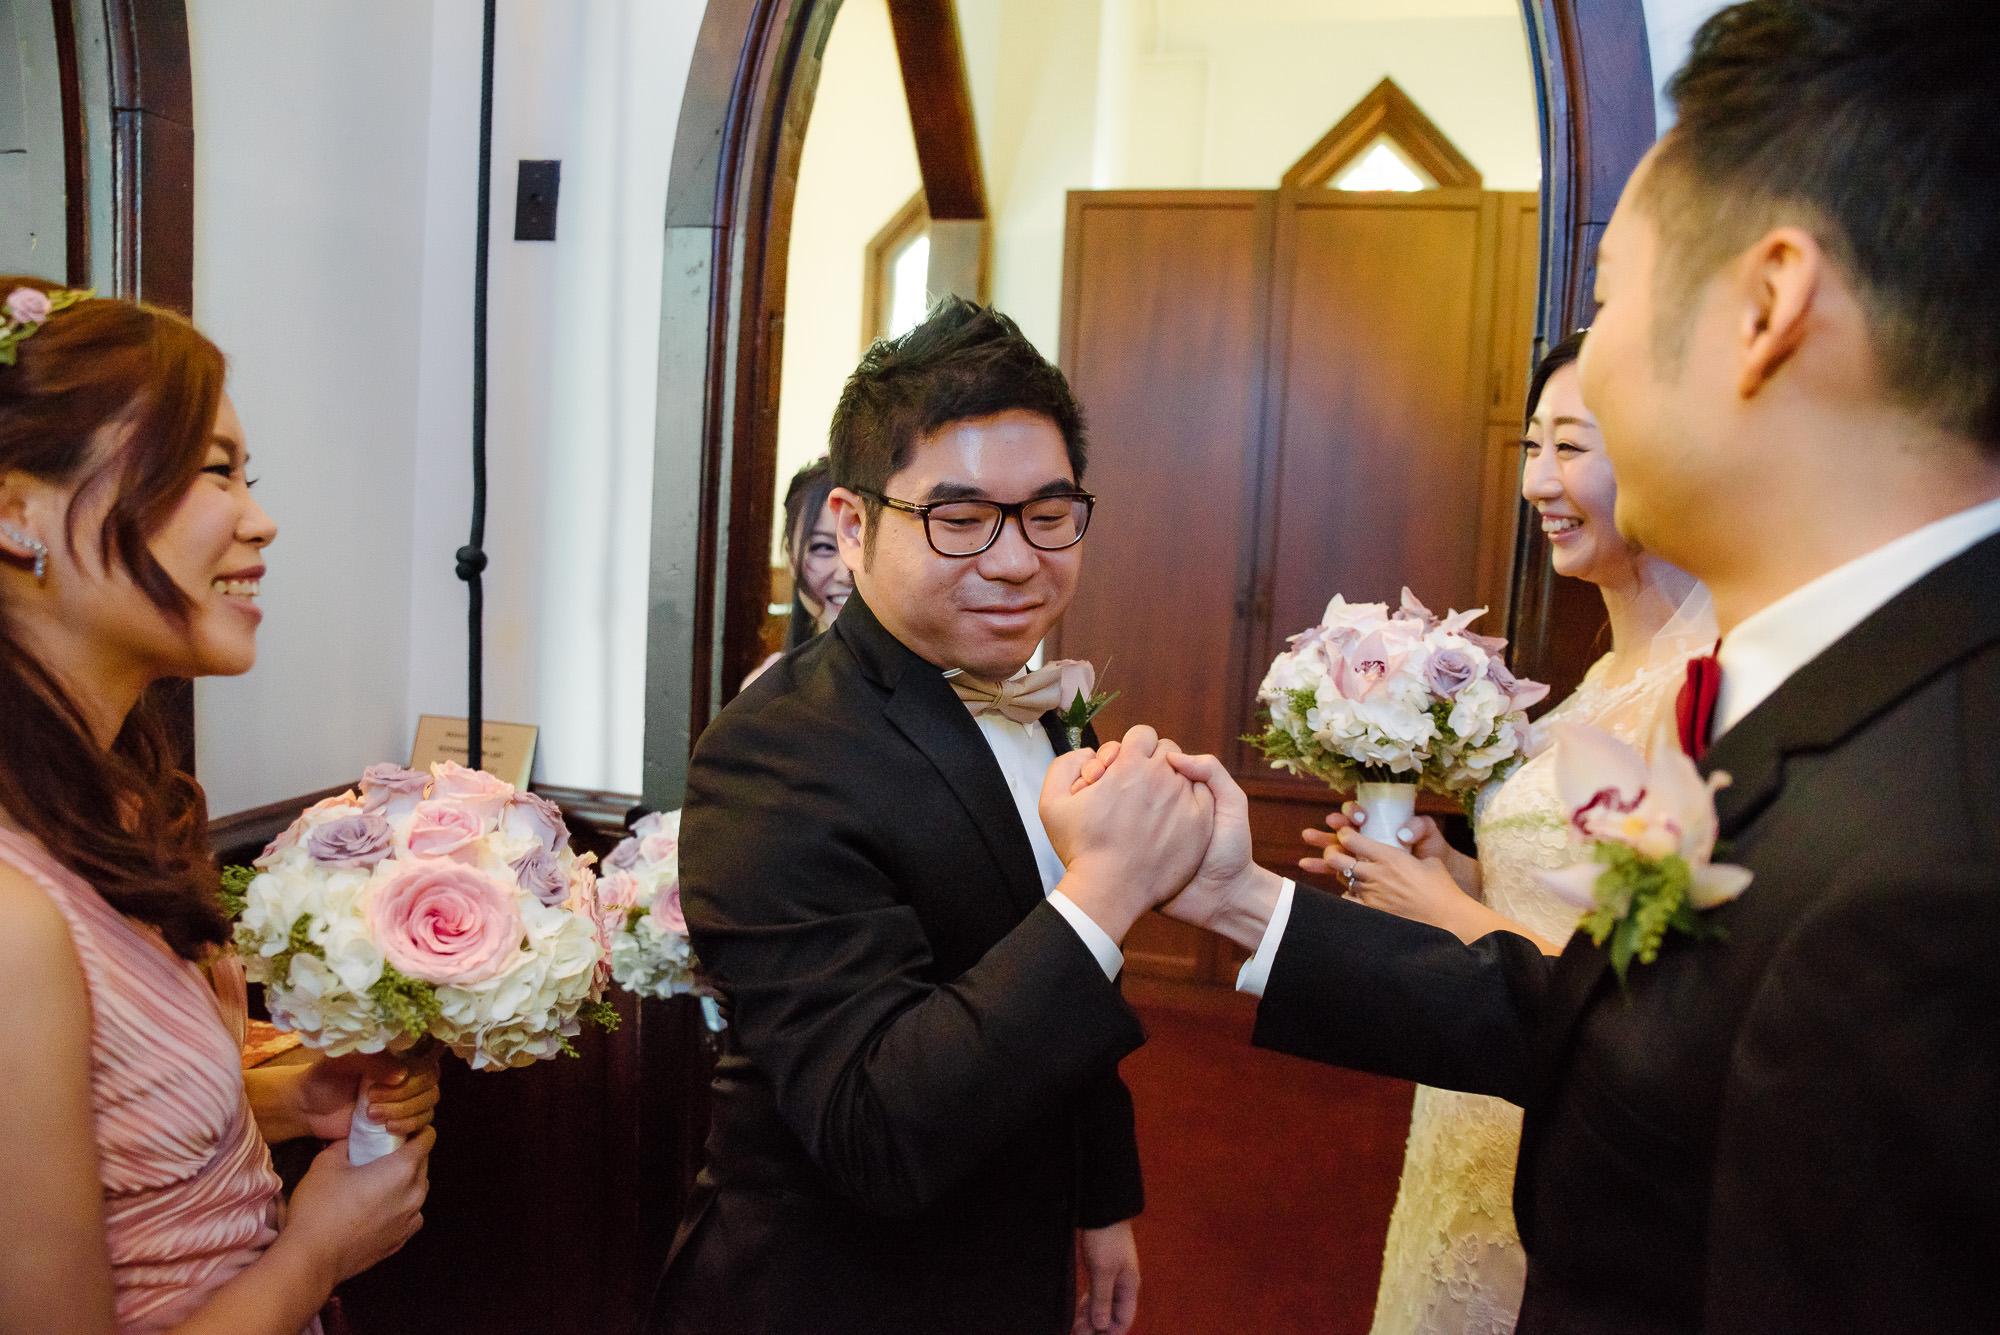 minoru_chapel_richmond_wedding_ceremony 16263013.jpg